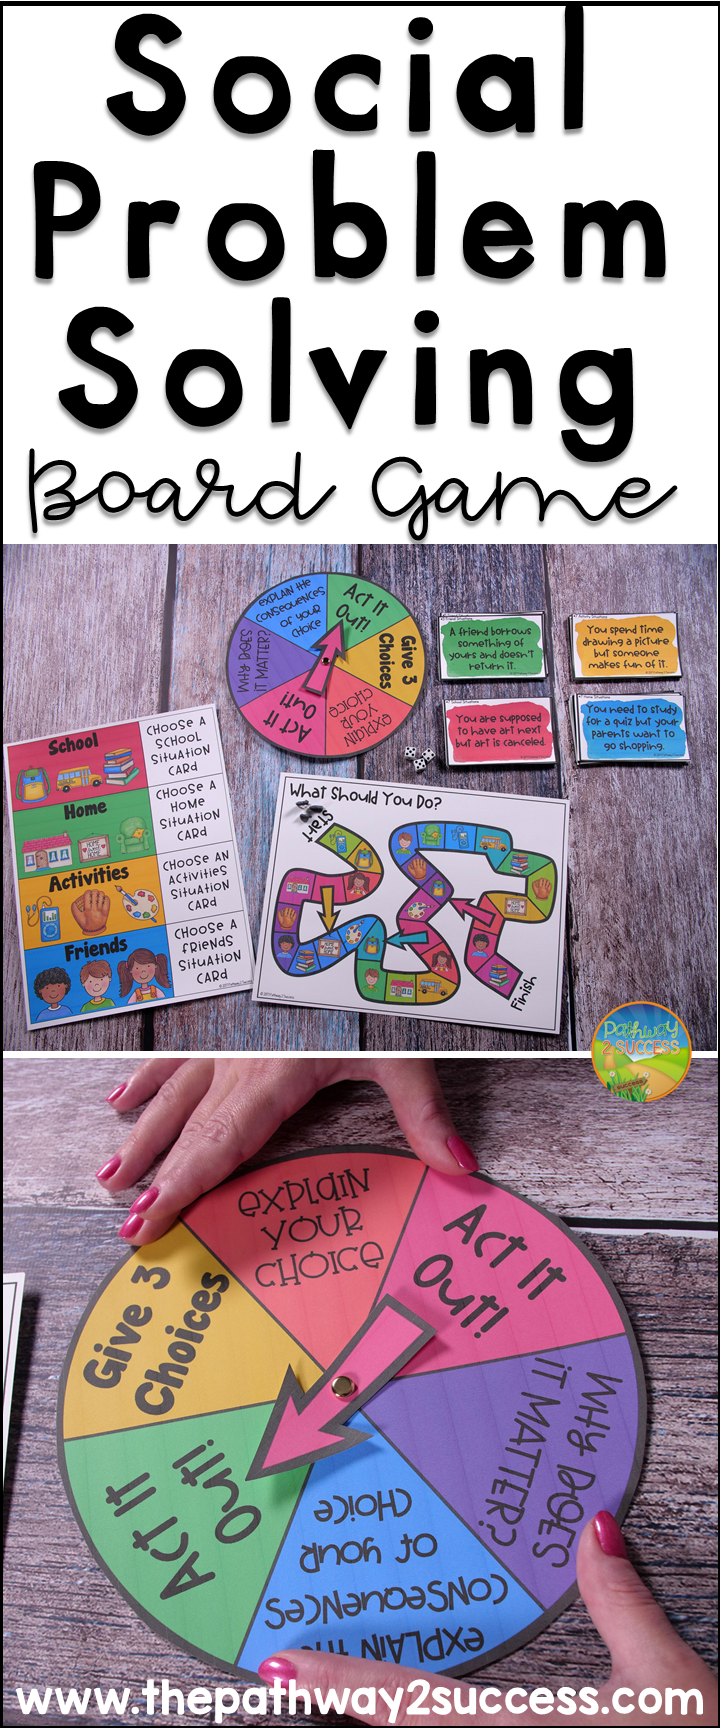 Social Problem Solving Board Game Social skills games